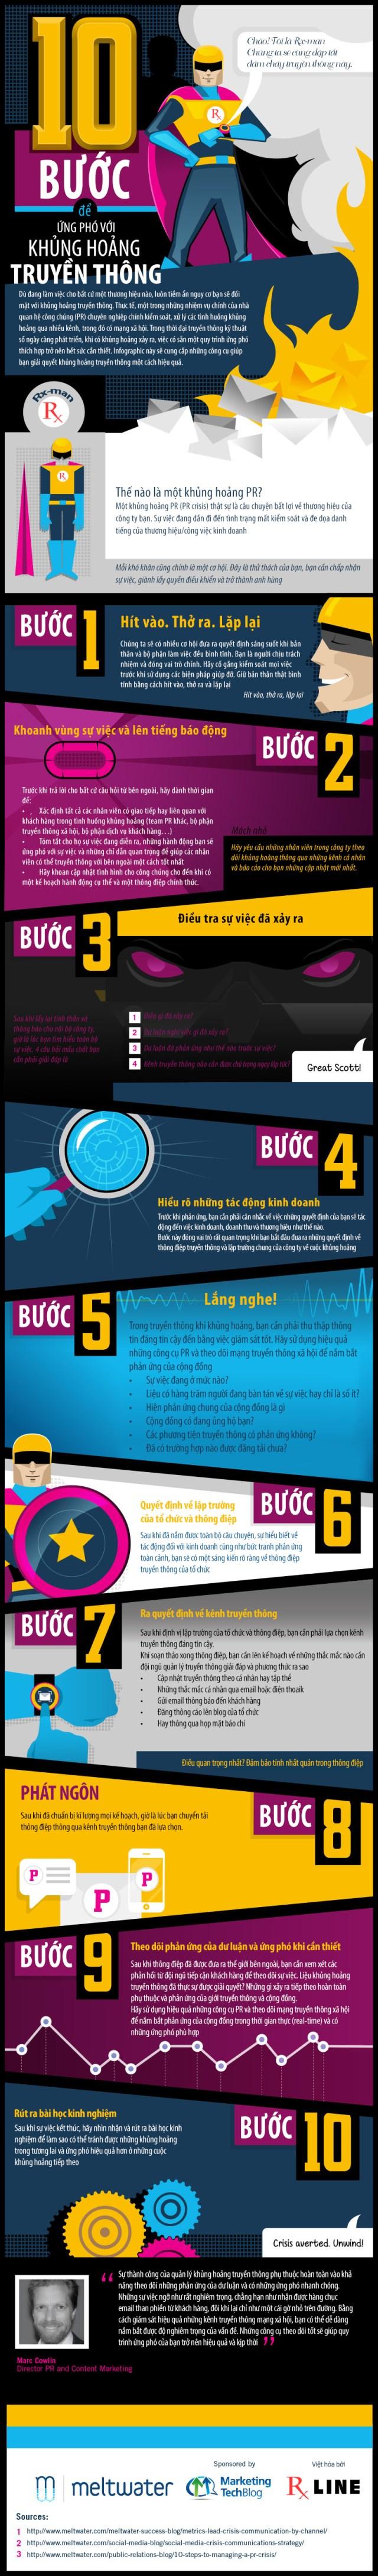 Nguồn: Infographic: 10 Step Crisis Communication Management, Meltwater. Việt hóa: rxline